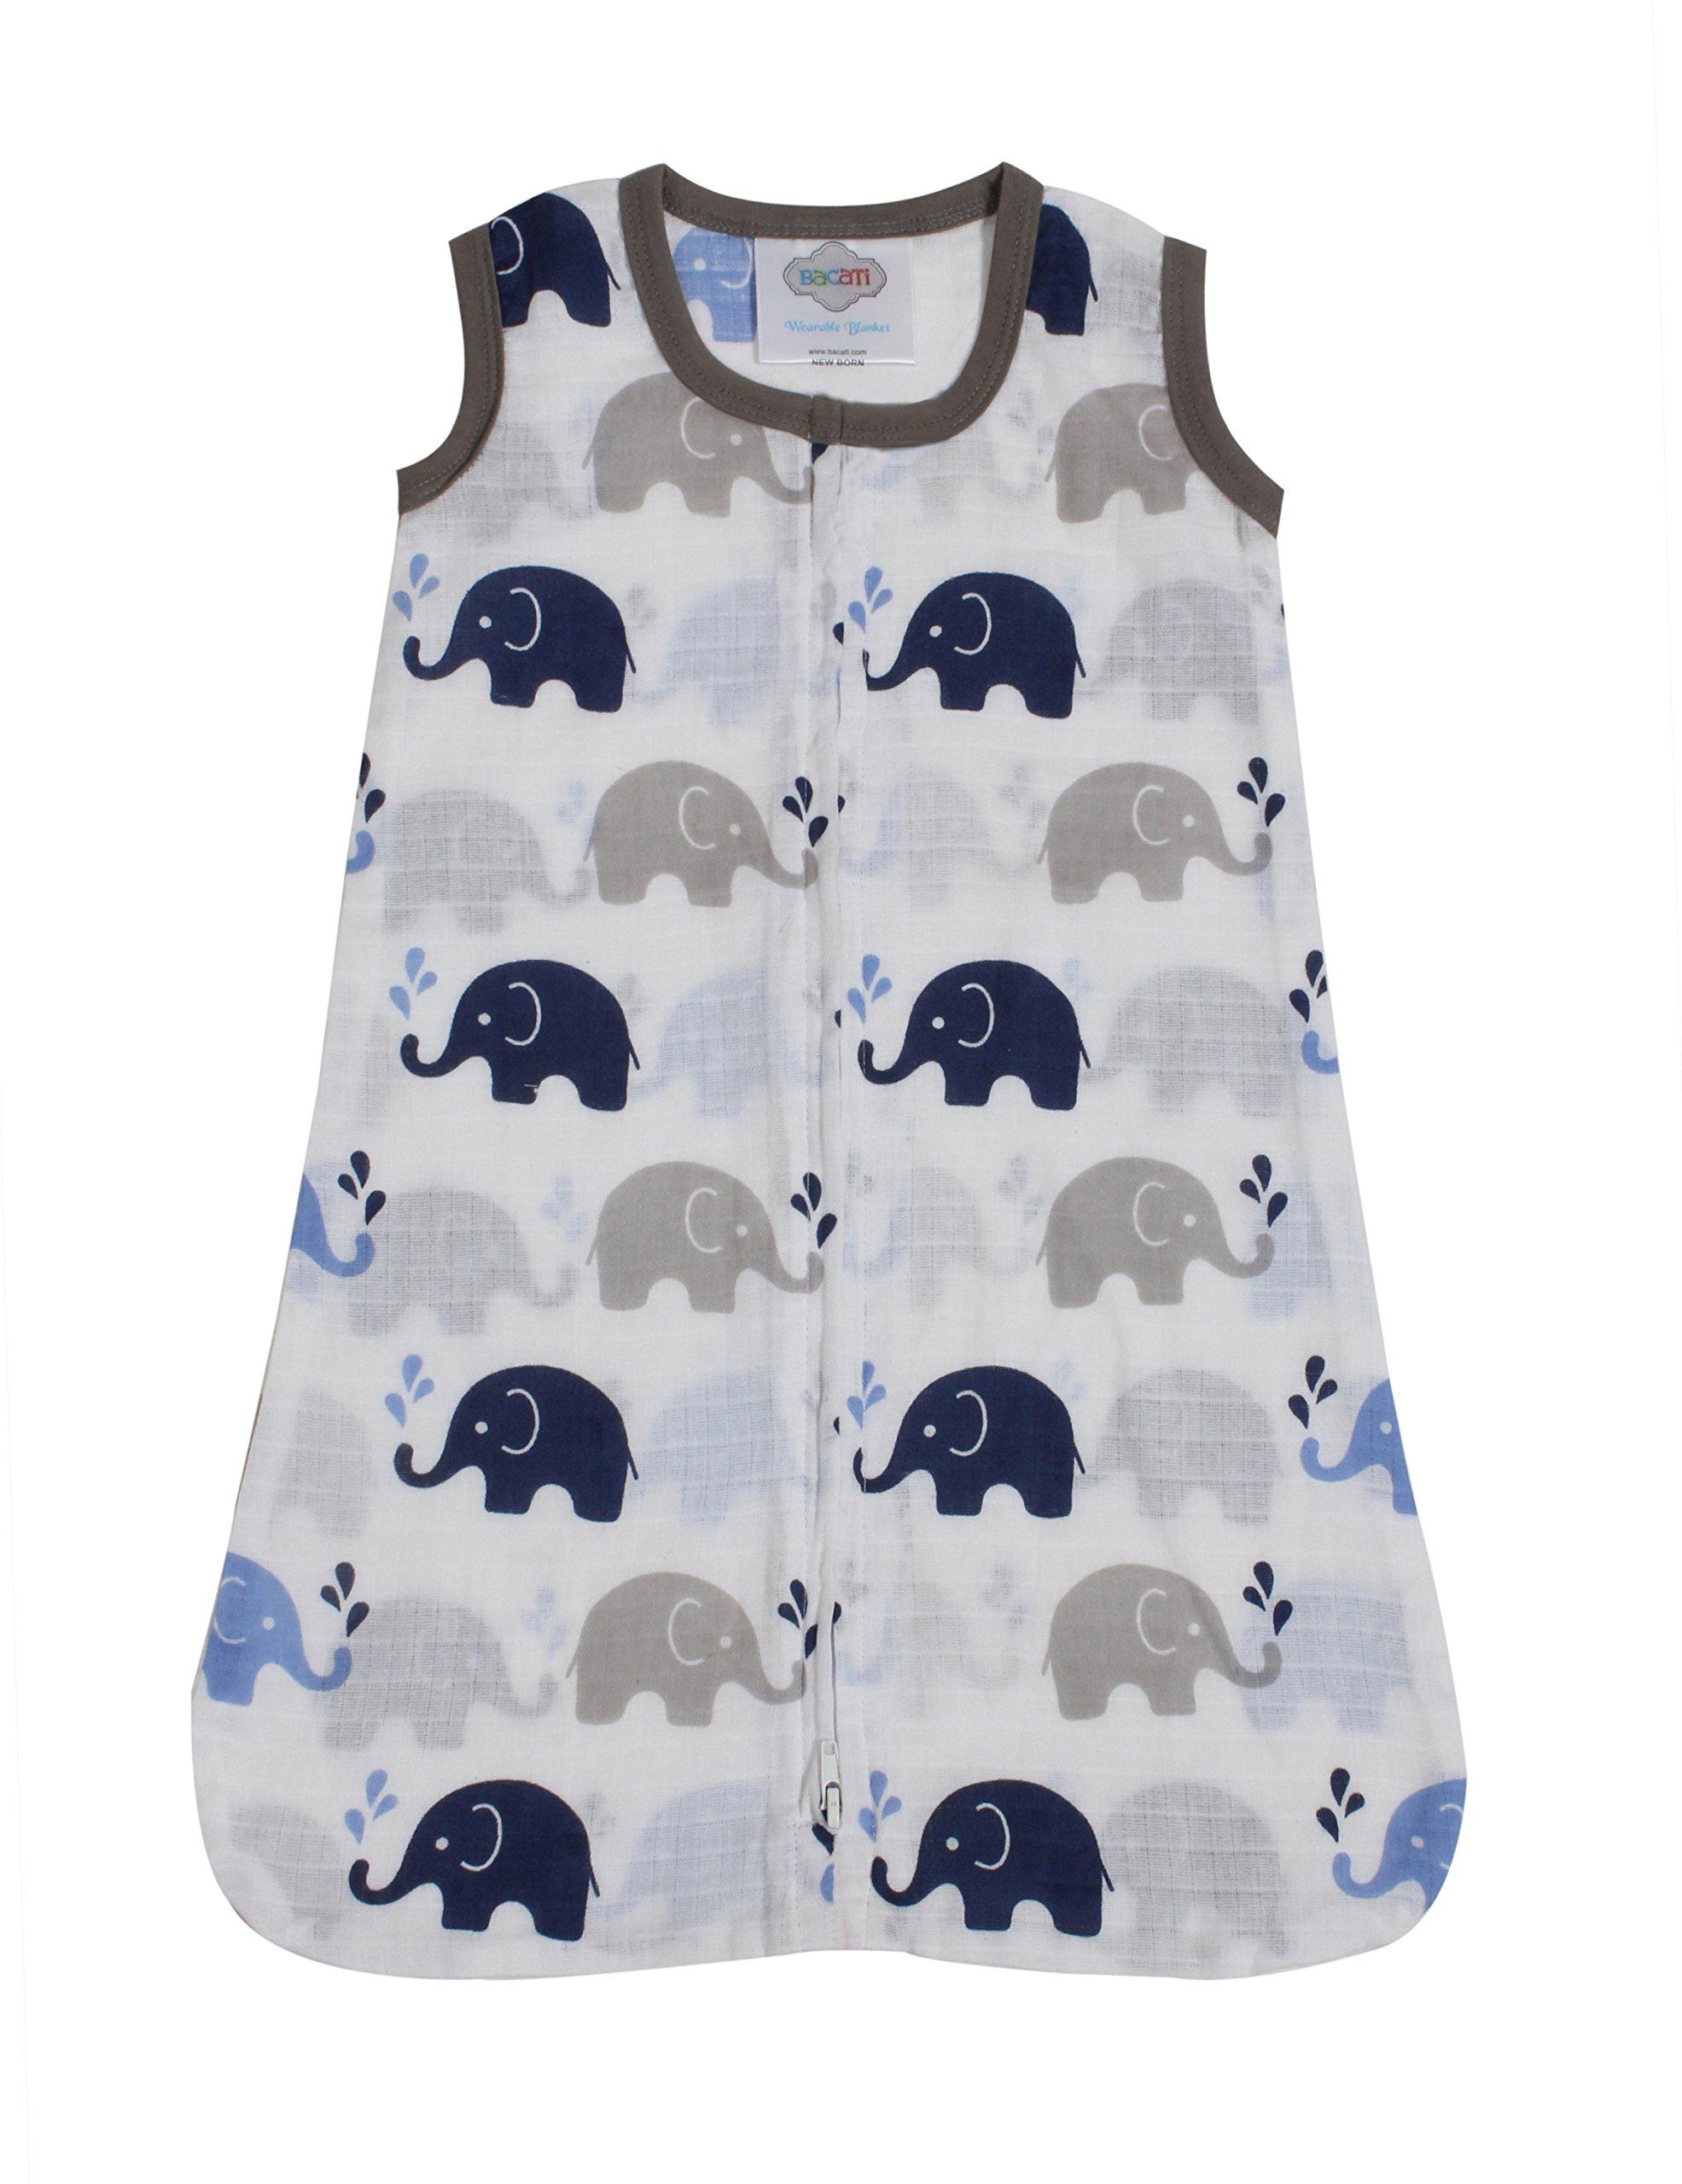 Bacati - Muslin Printed Sleeping Bag (Wearable Blankets) (Newborn, Elephants Blue/Grey)